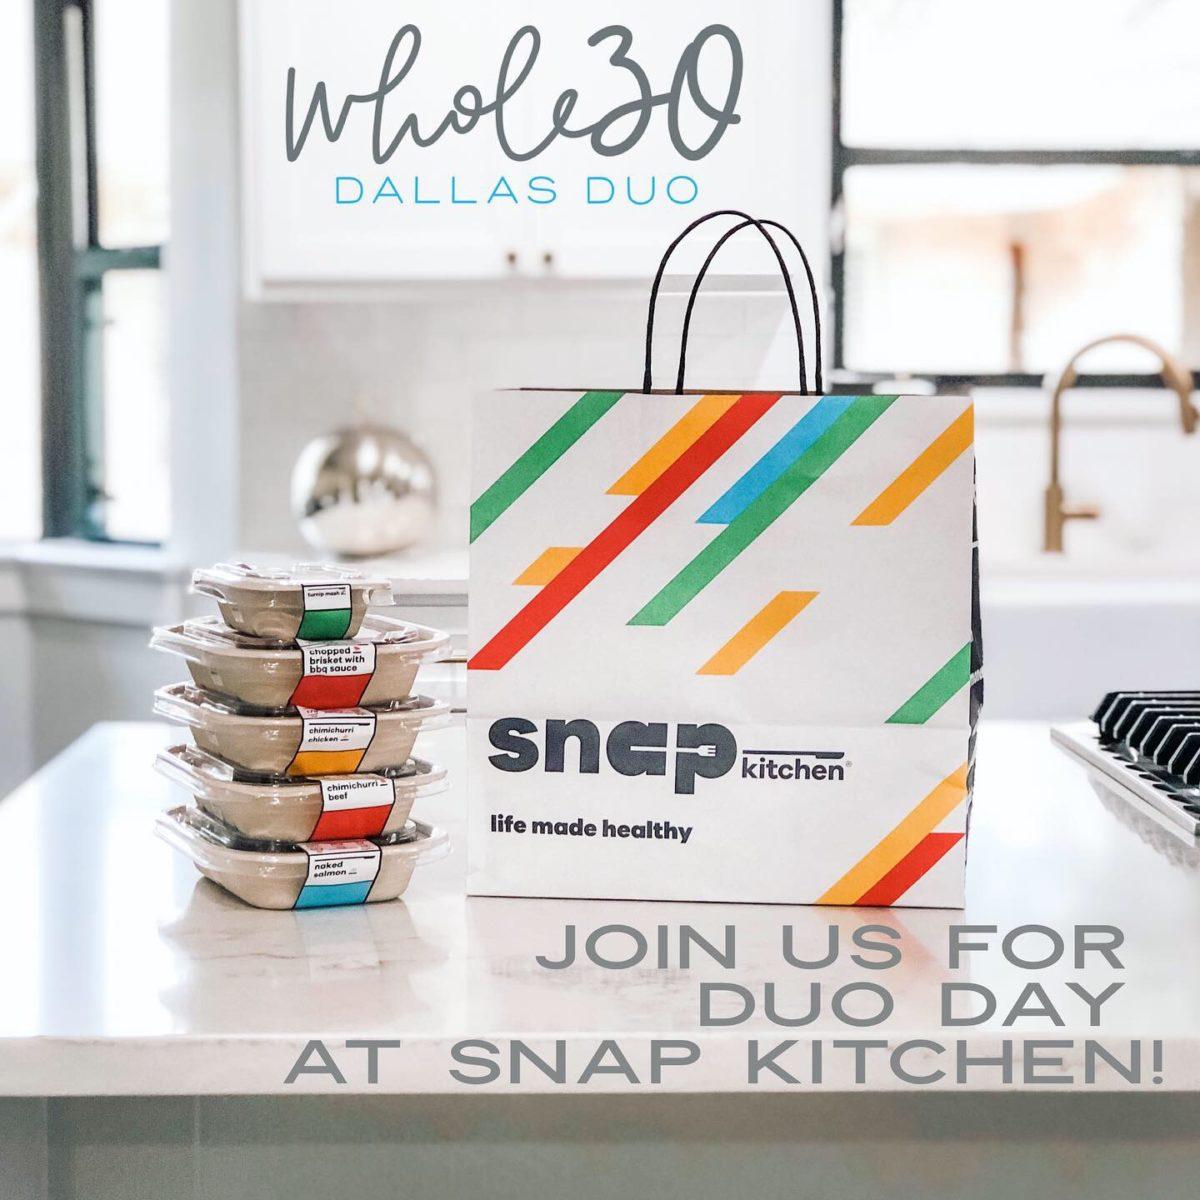 Snap Kitchen Whole30 Dallas Duo Event